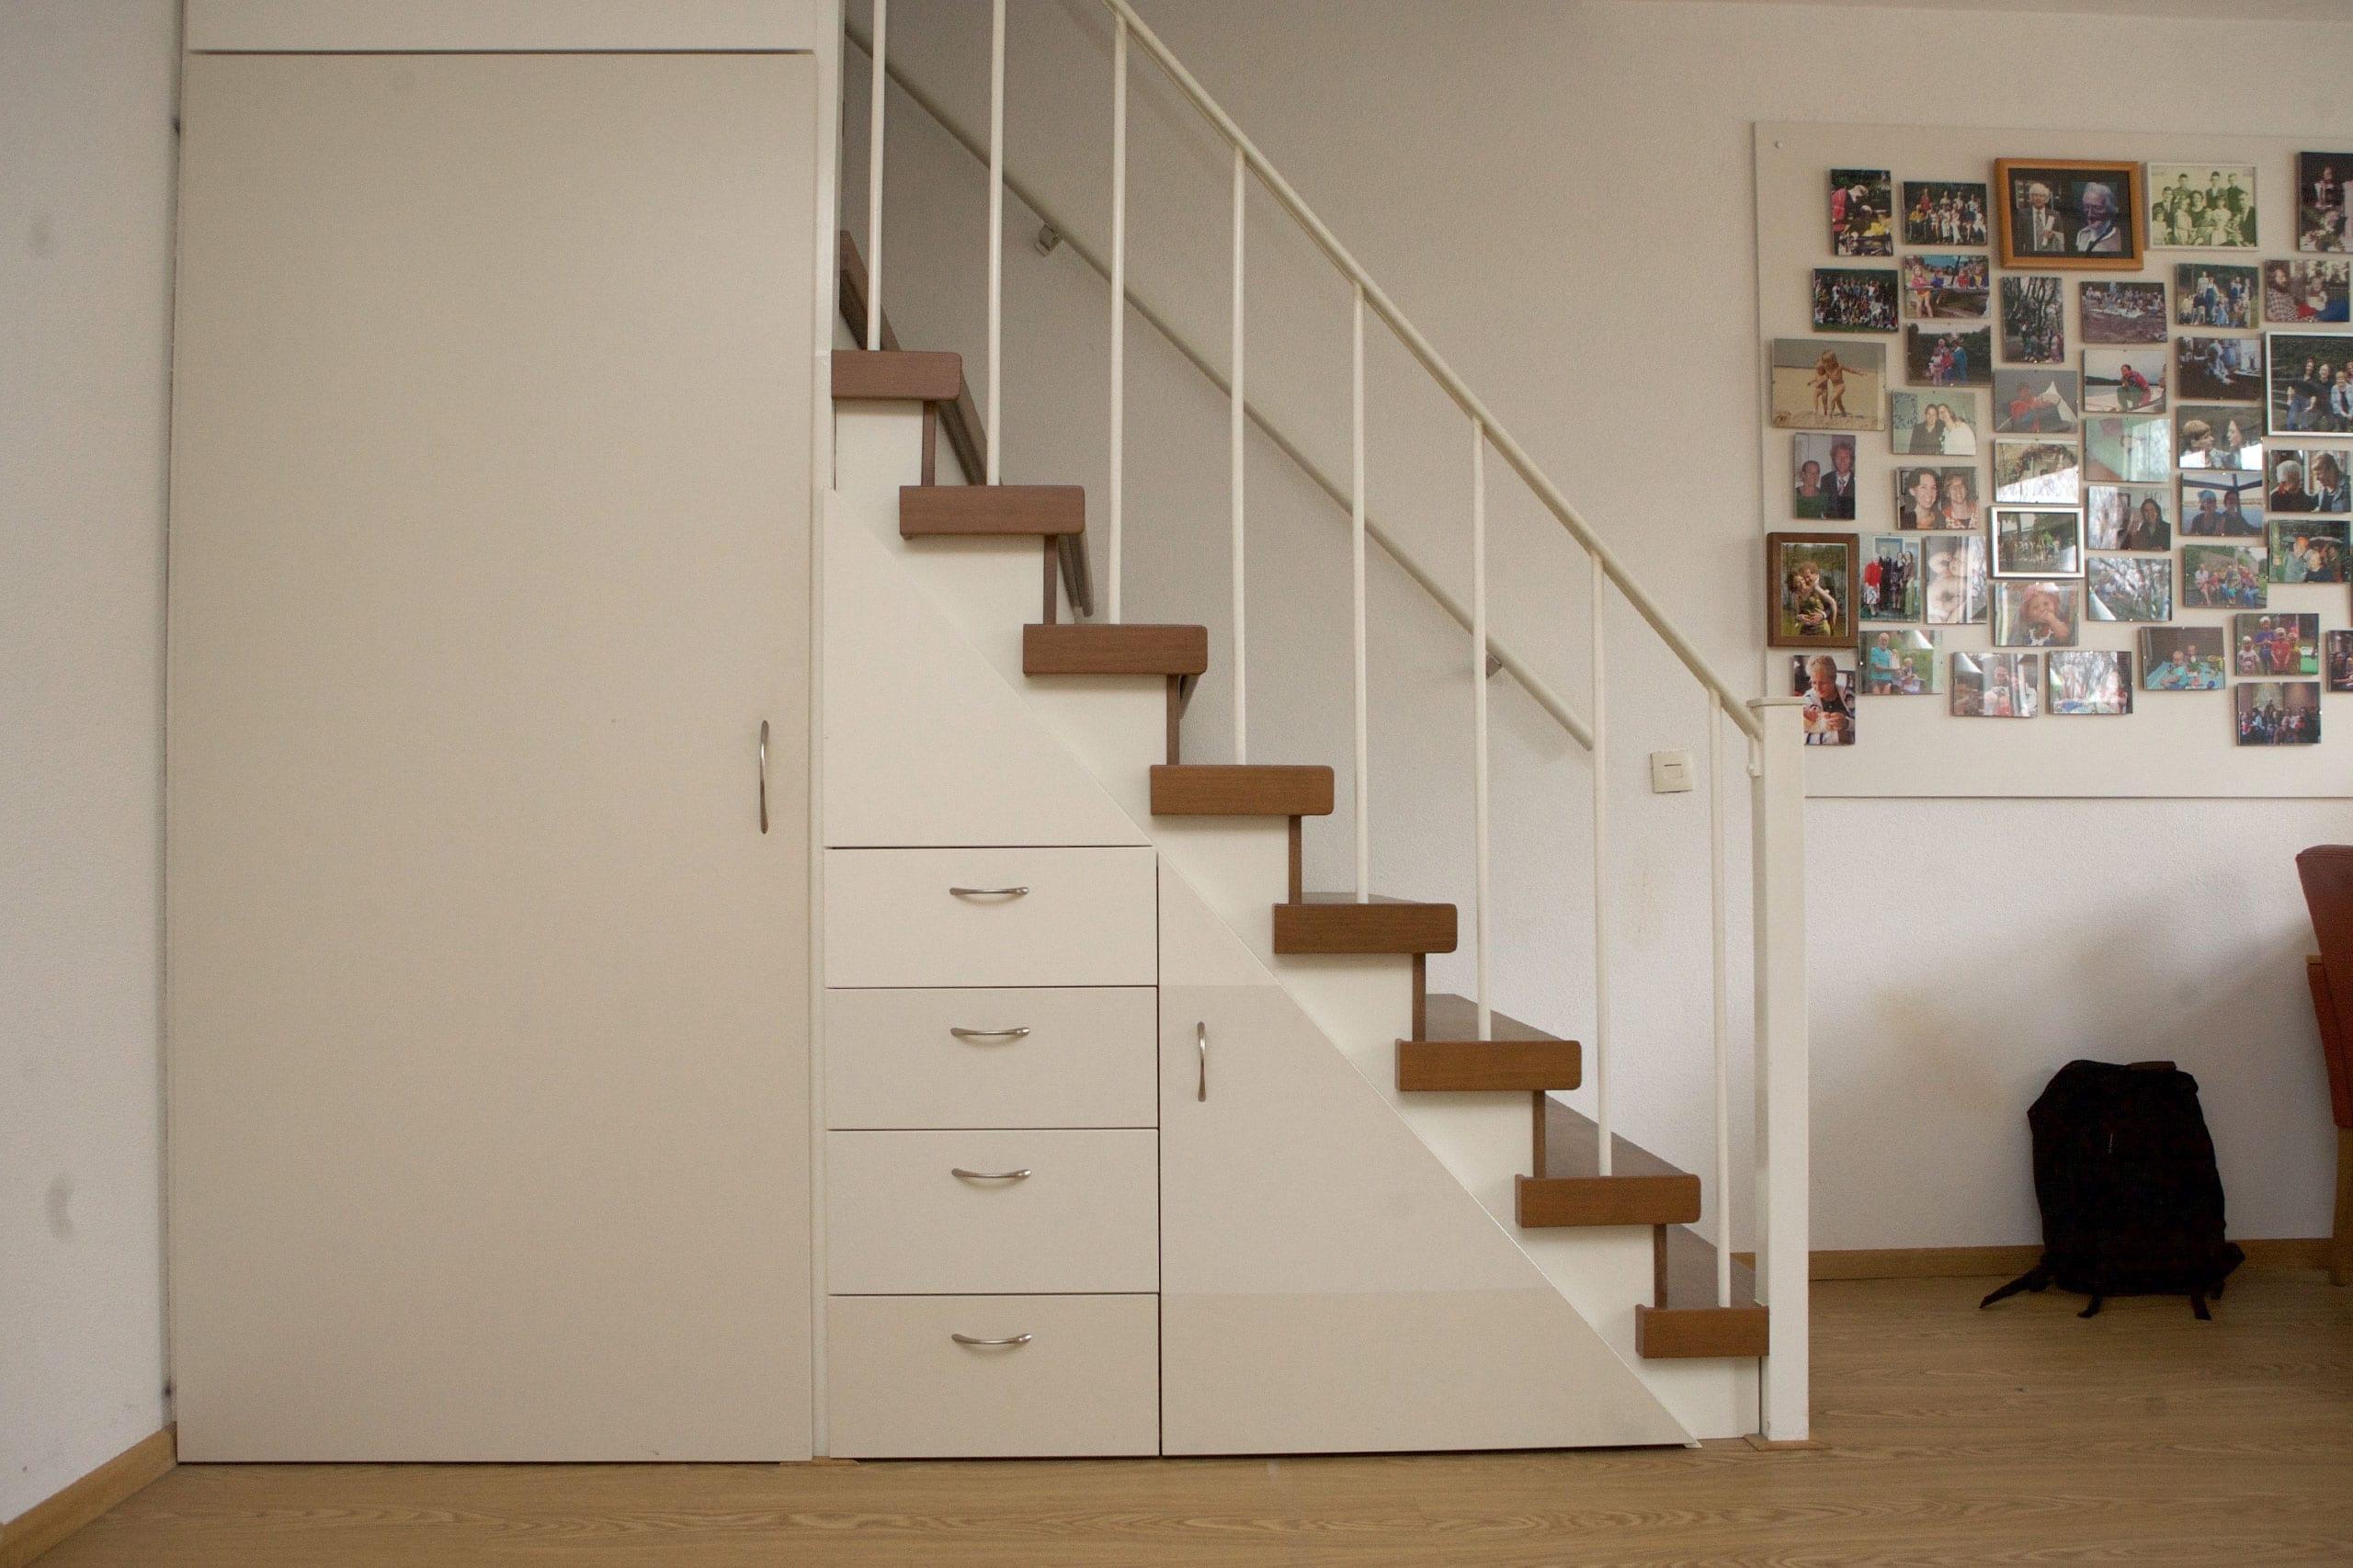 trapkast-ontwerp-op-maat